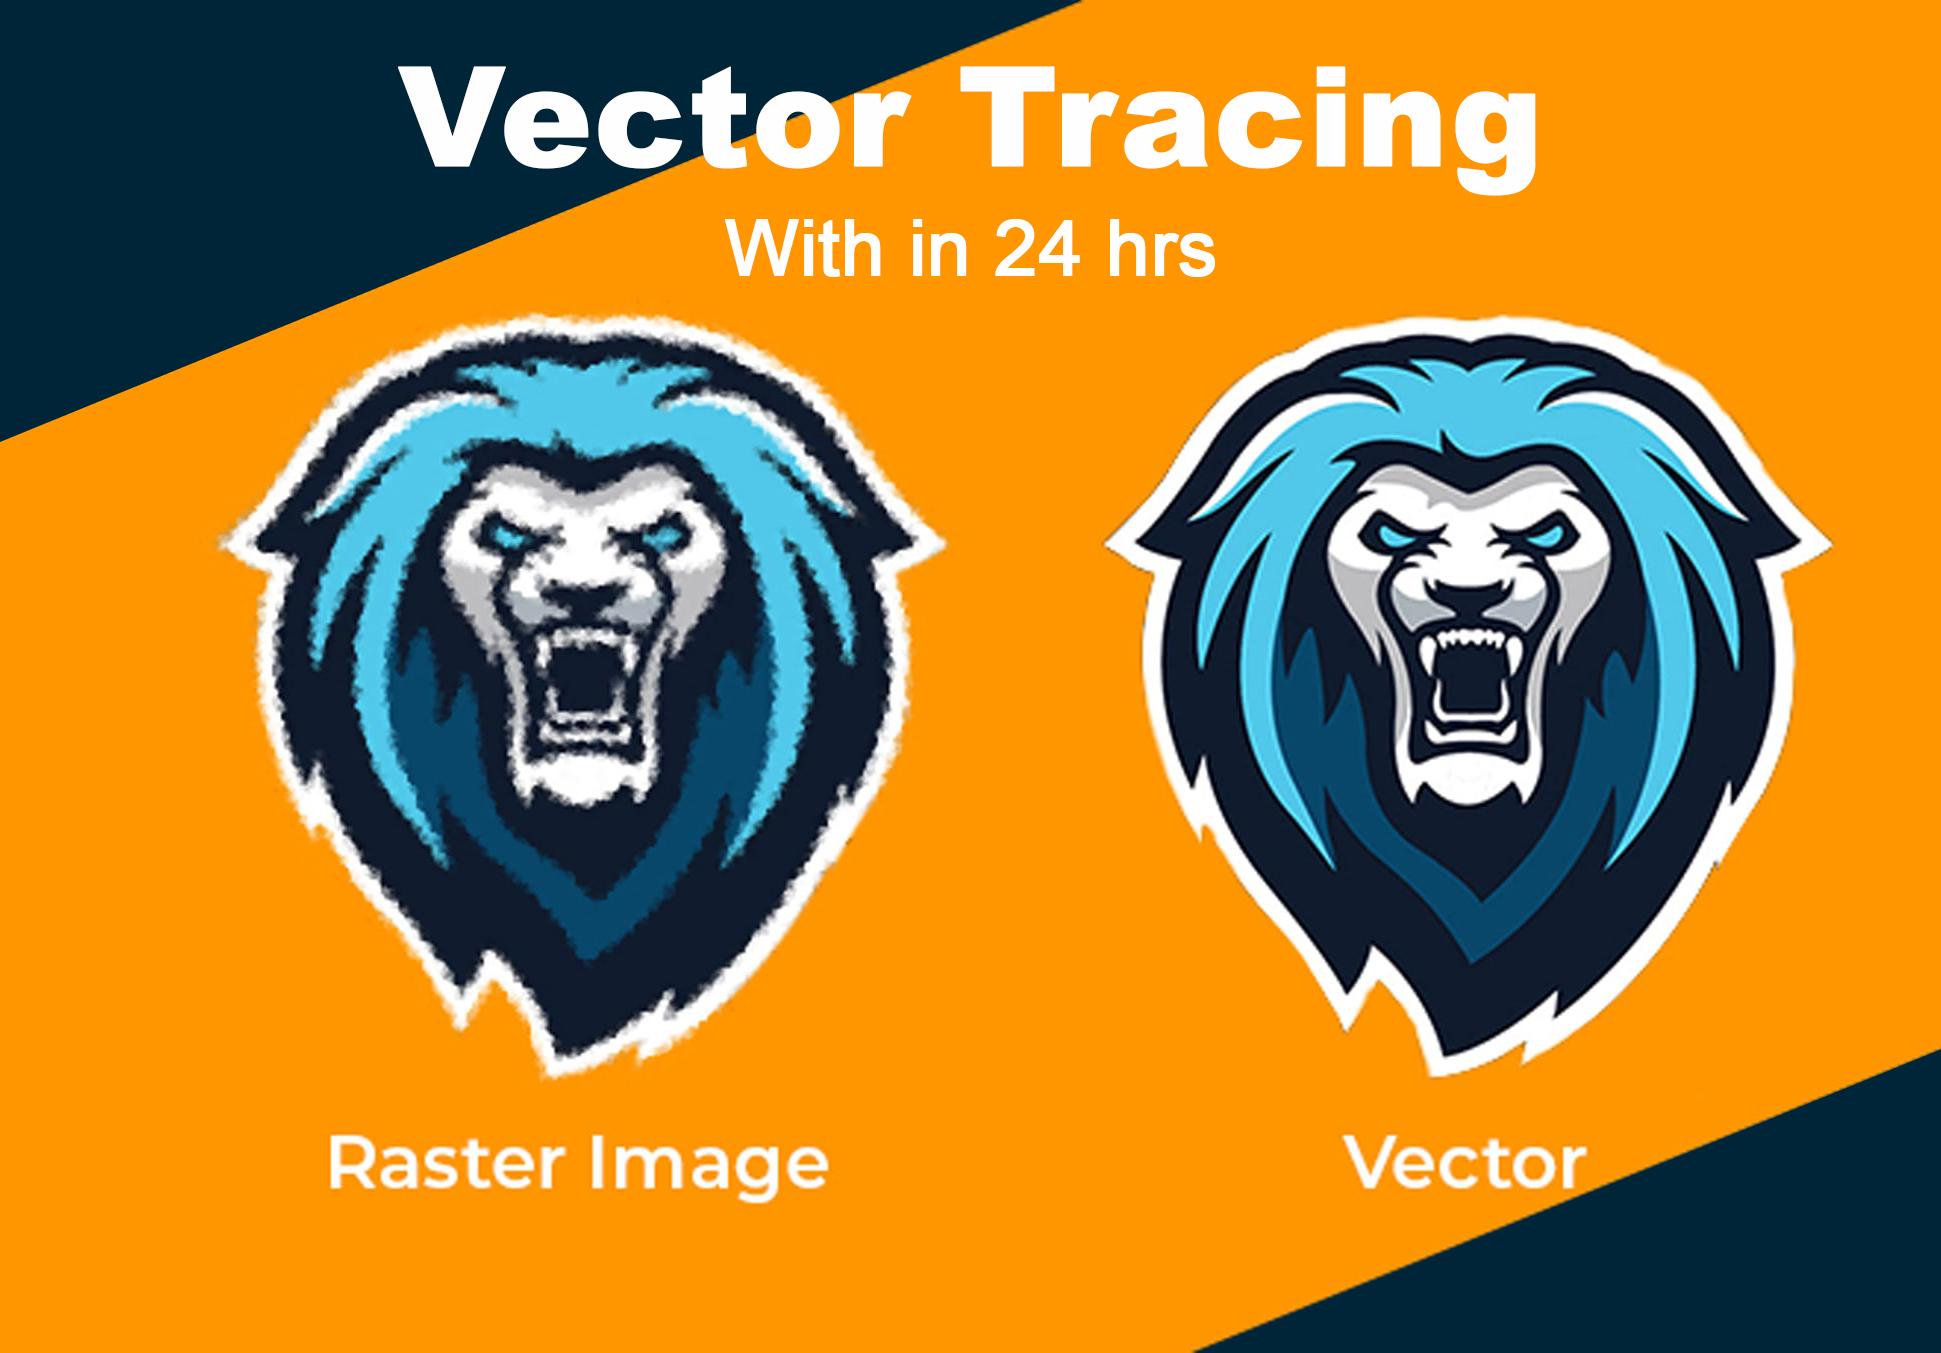 I will vectorize logo,  icon,  convert to vector,  vector tracing